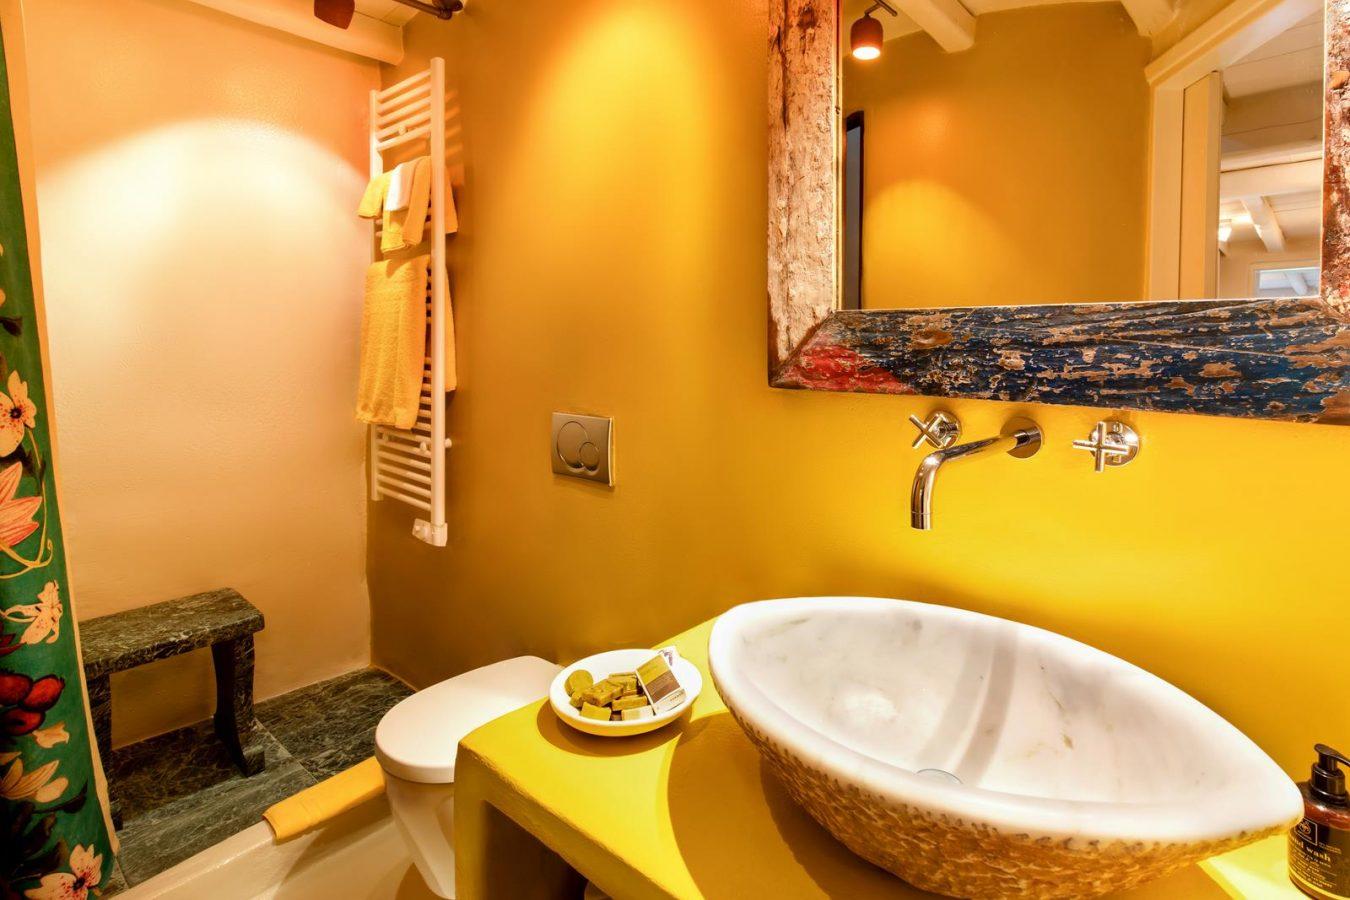 Tinos accommodation - Tinos E-Houses